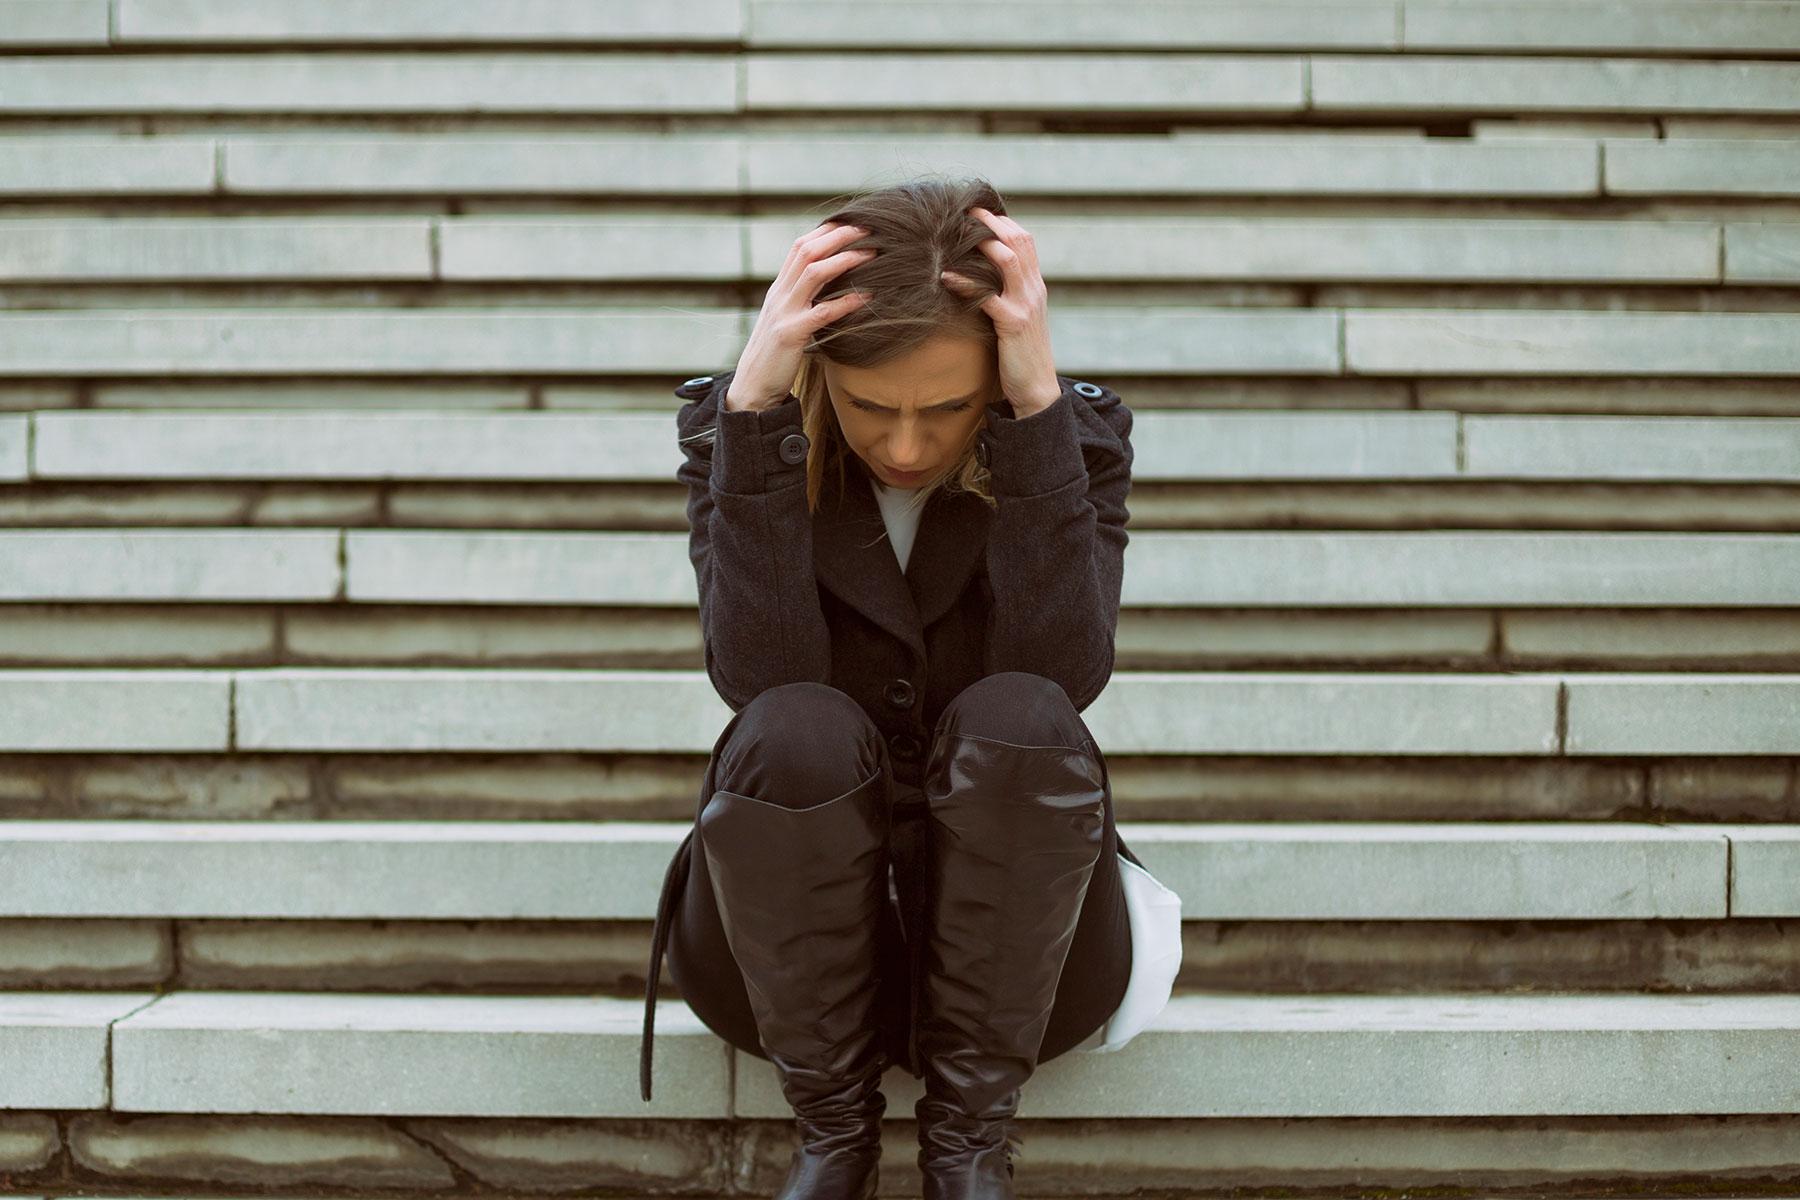 Women sitting on step upset